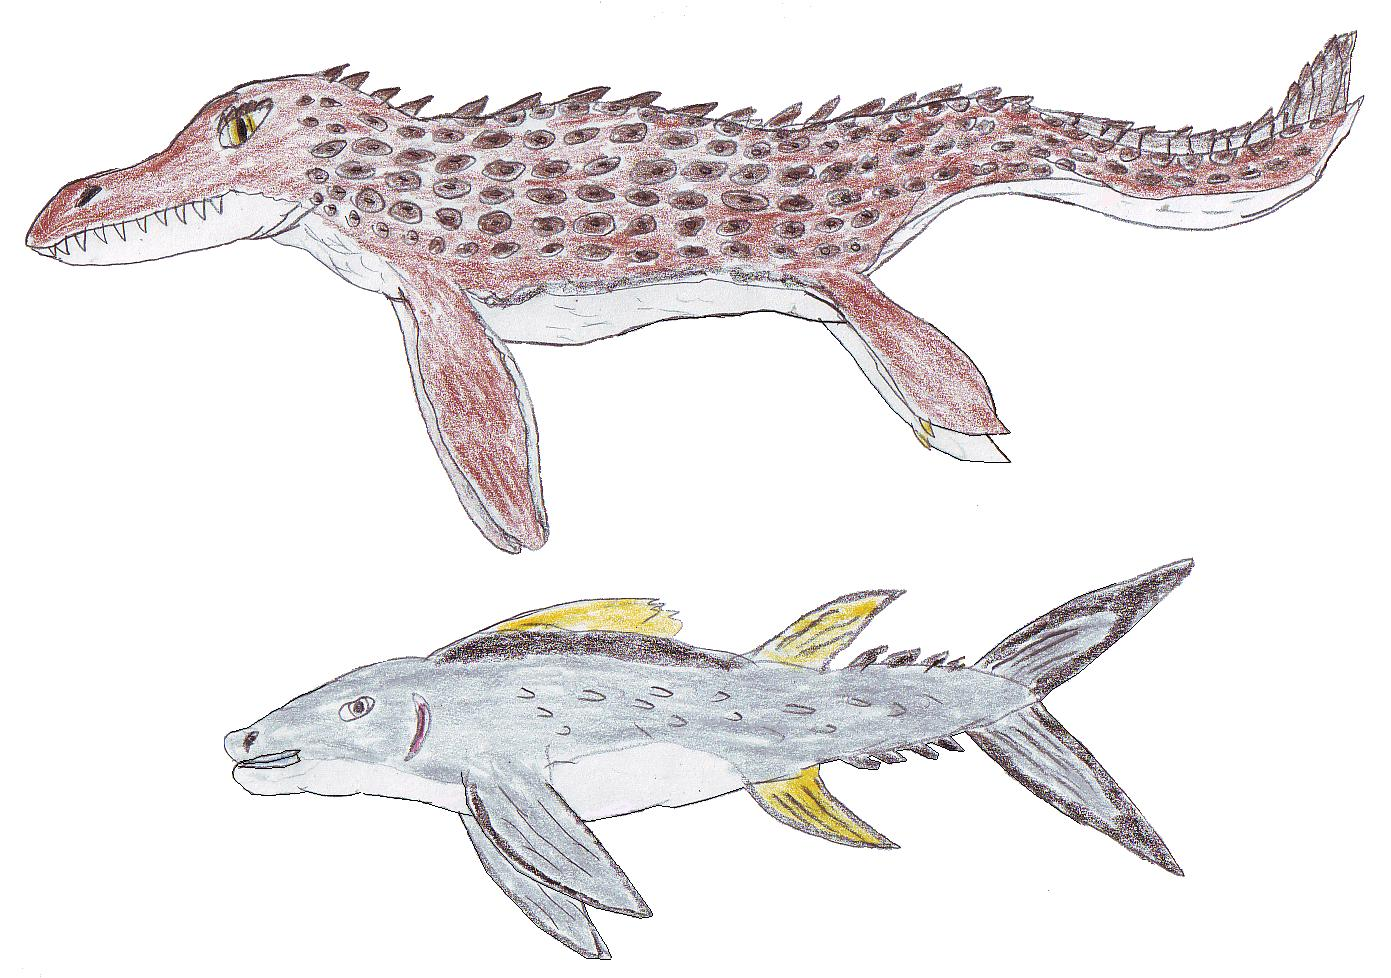 Cenozoic Mosasaur- Giant Tuna by Dinalfos5 on DeviantArt